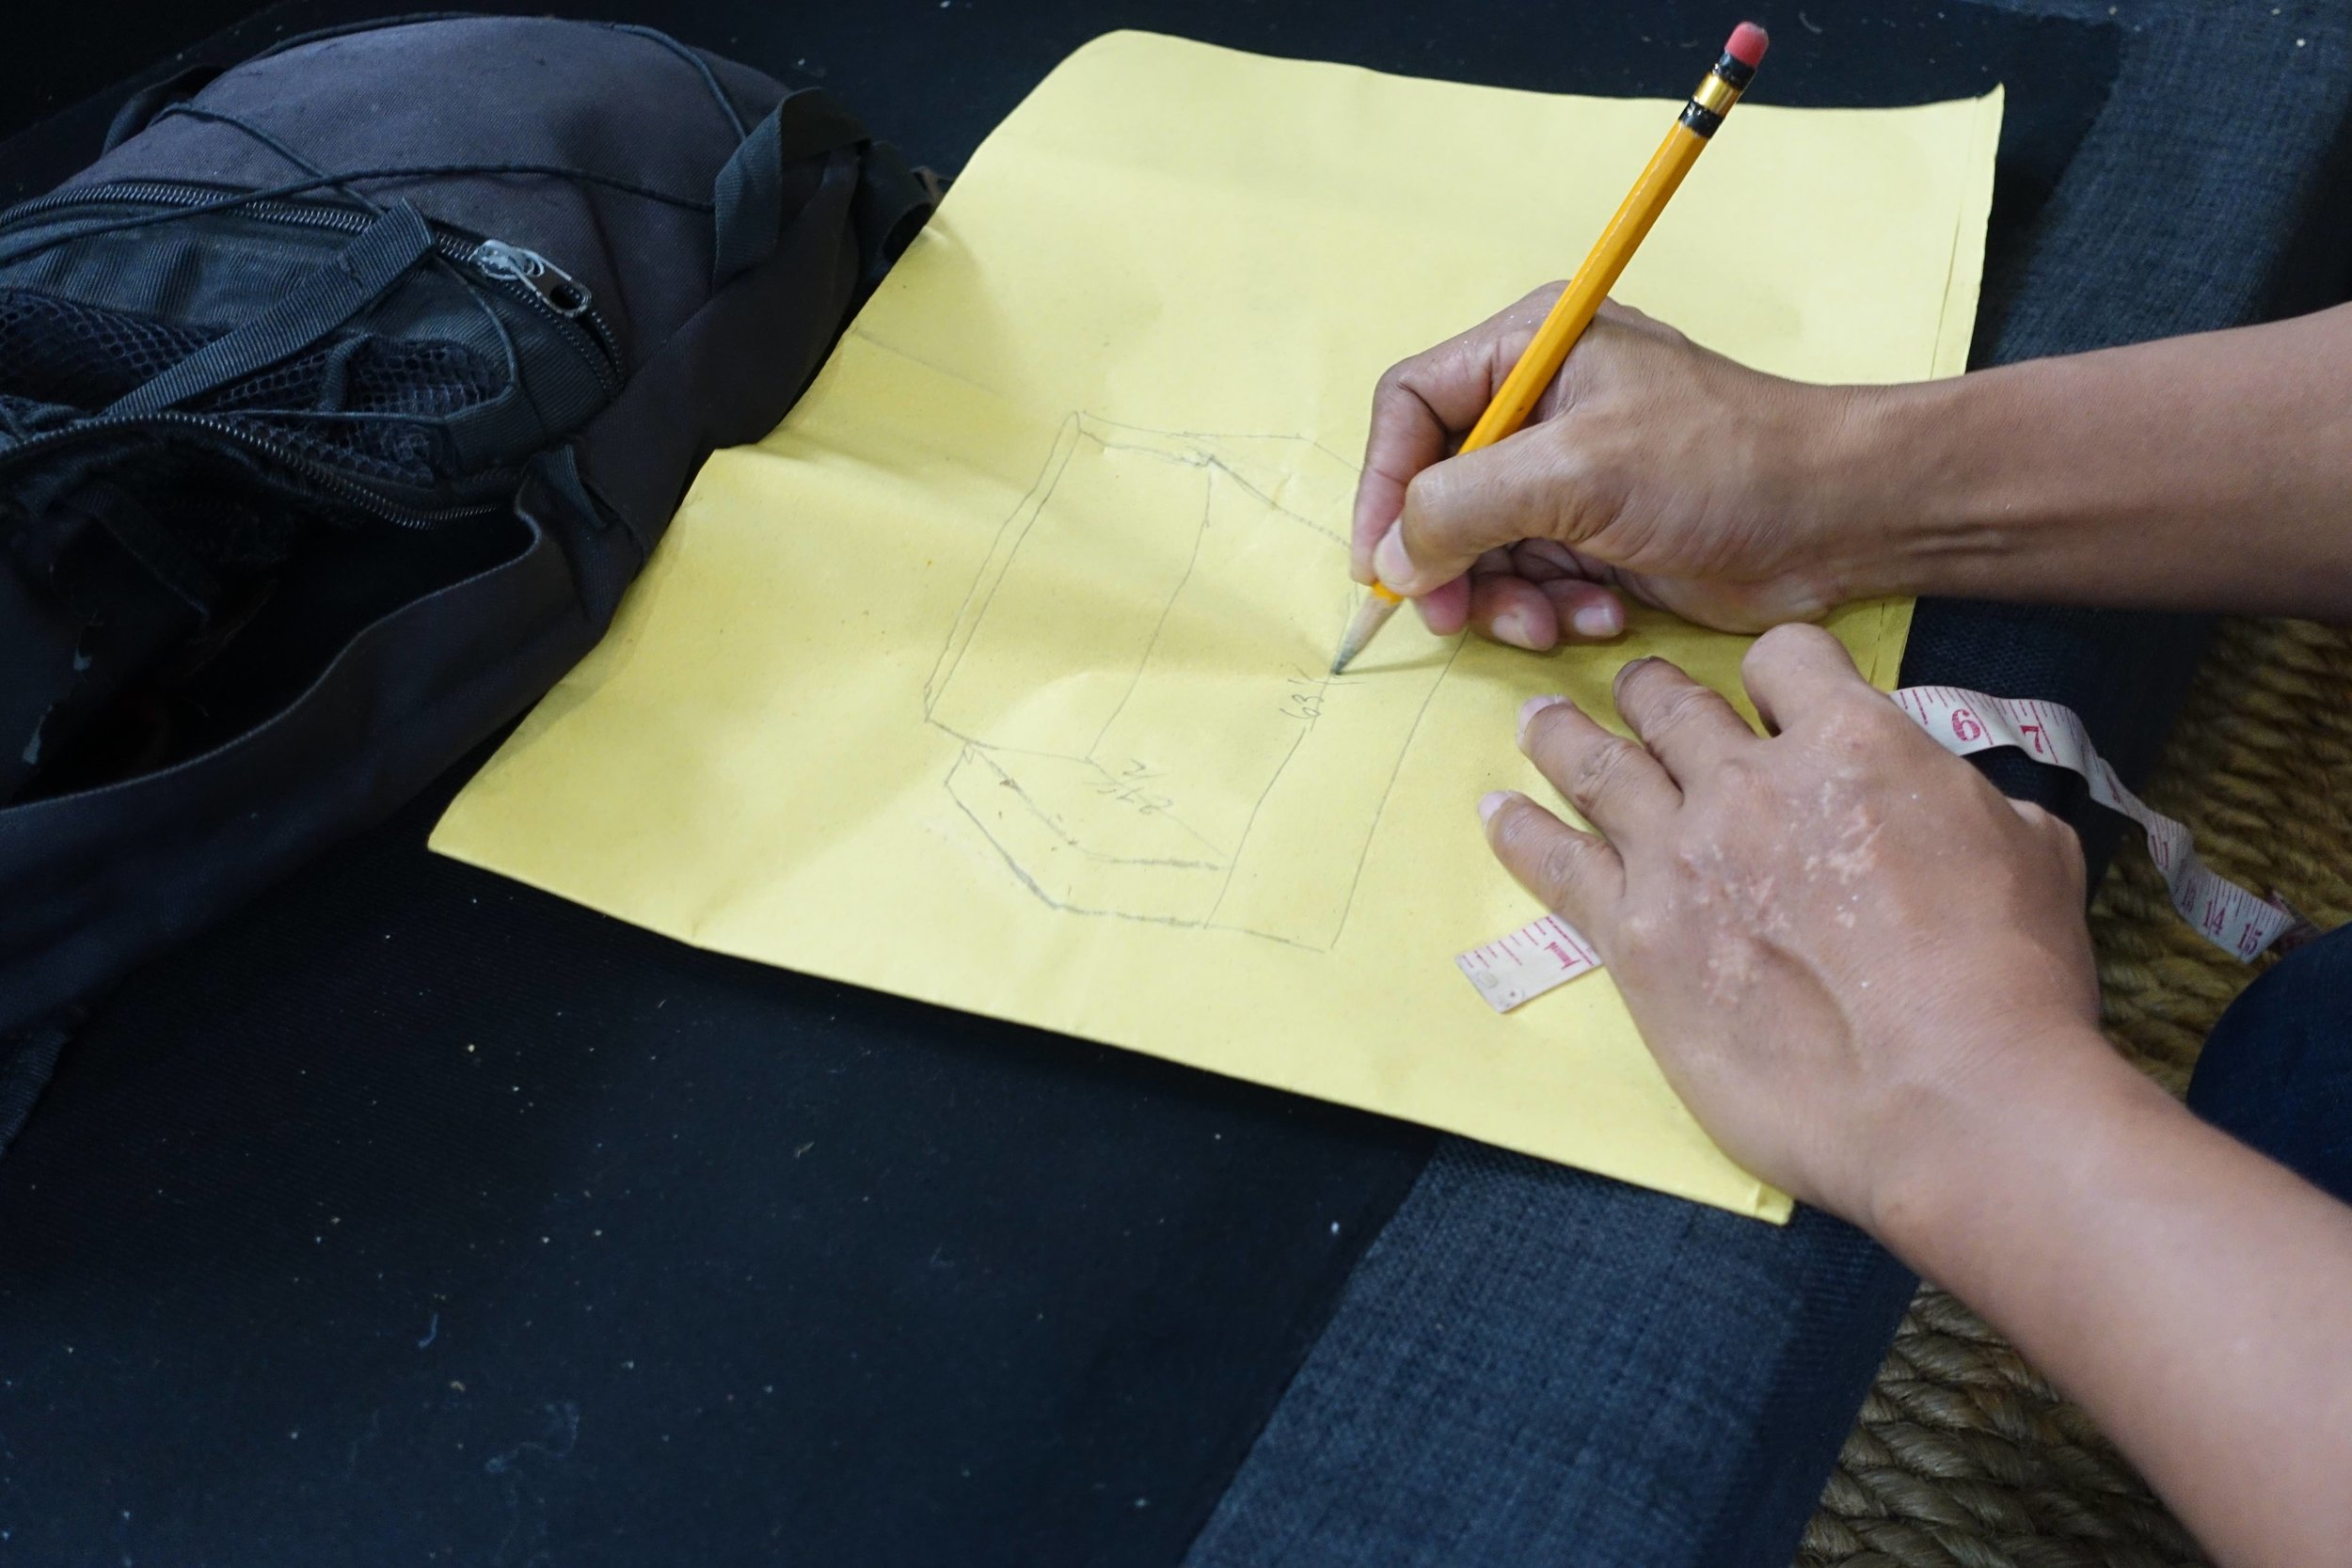 kuya sketches